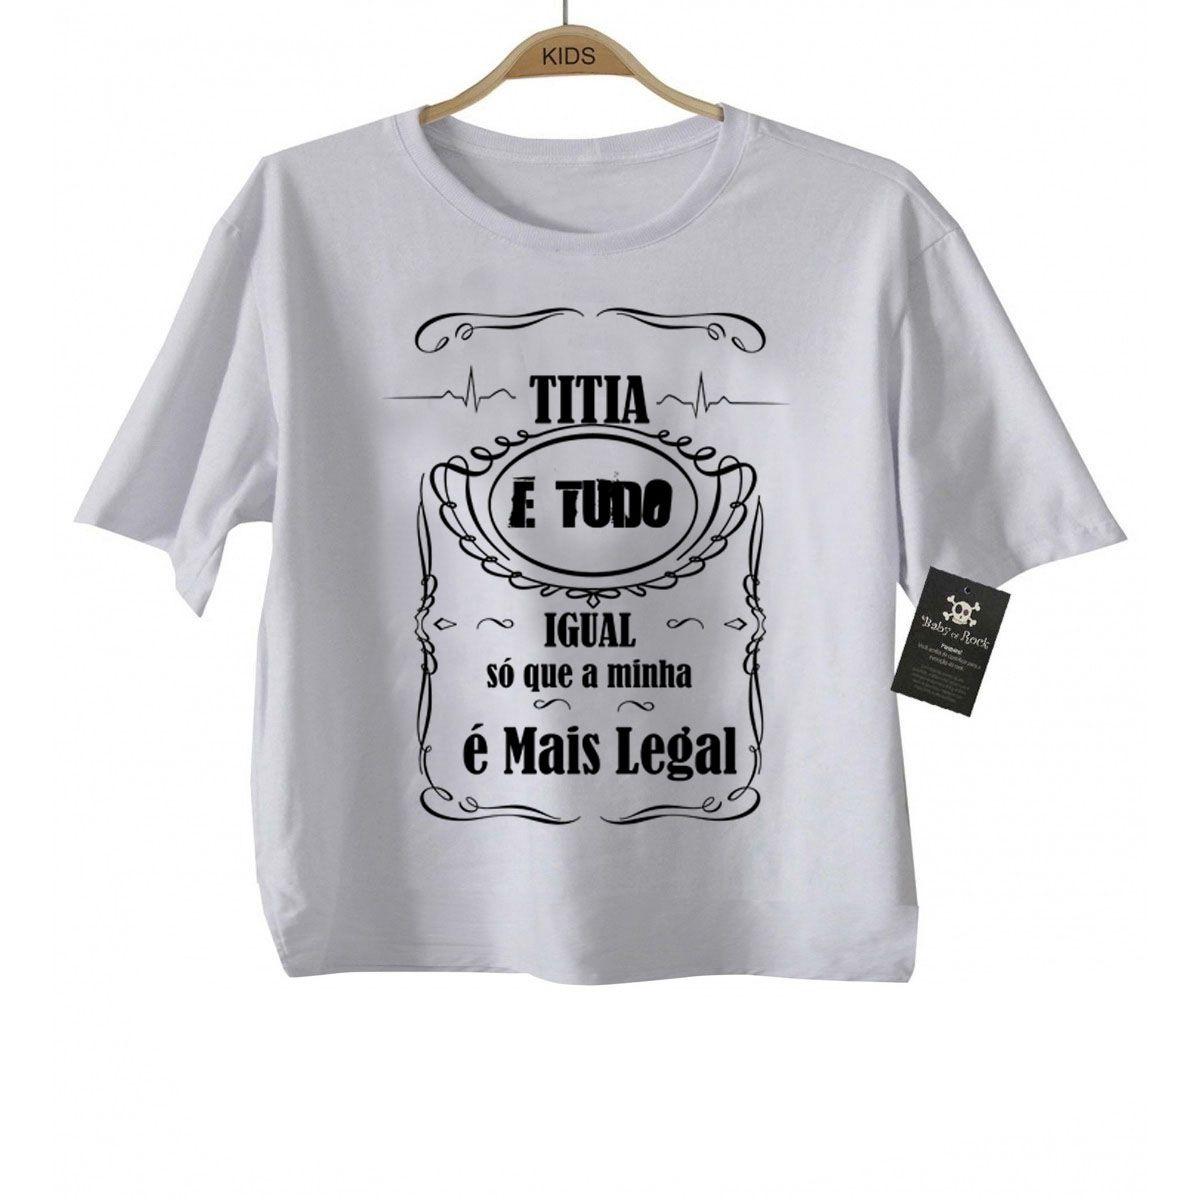 Camiseta  Titia e tudo igual - White  - Baby Monster S/A